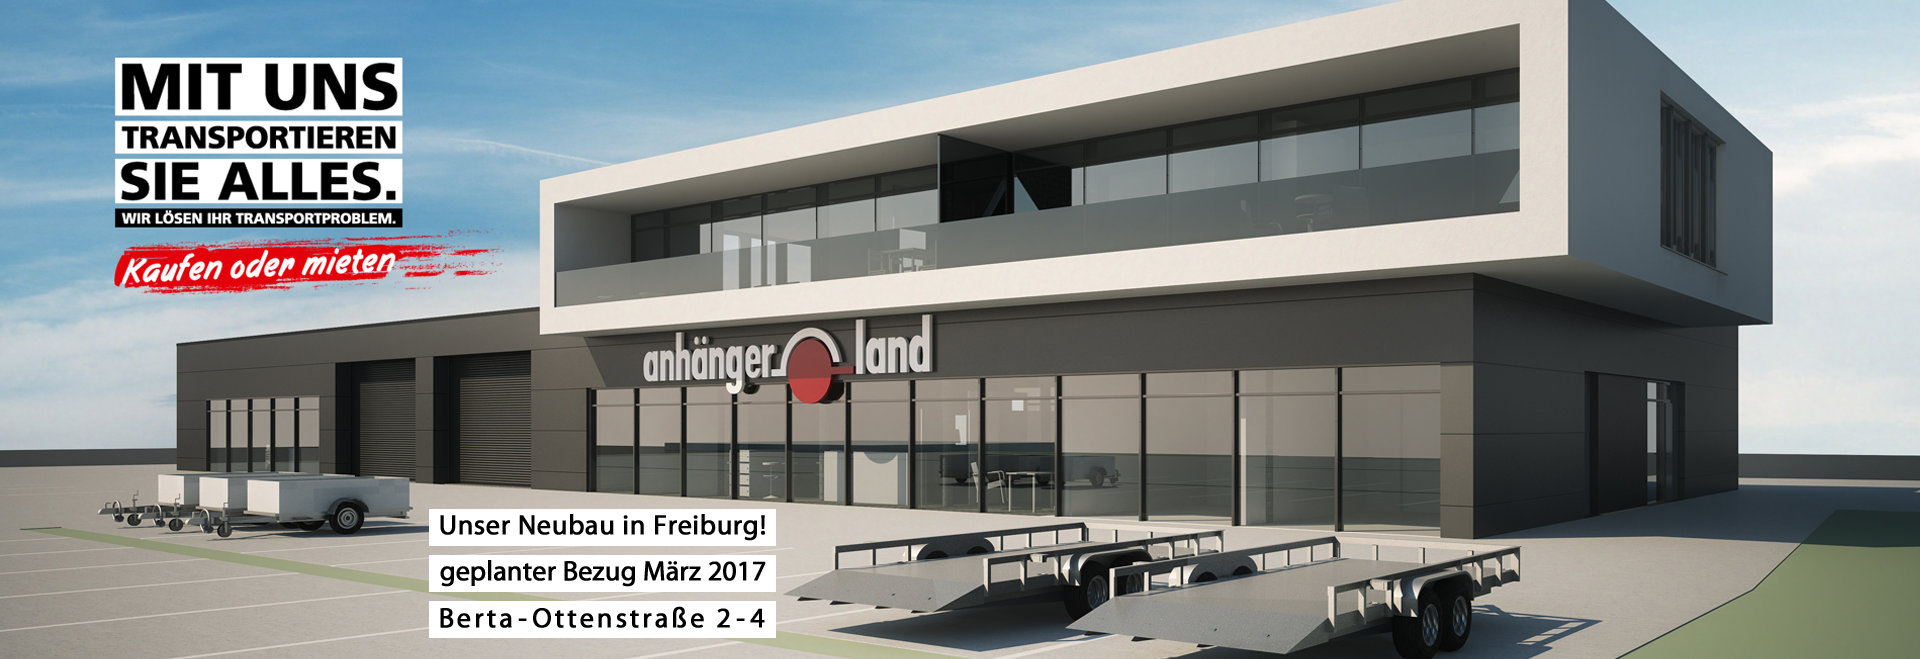 Anhängerland Freiburg I CARRÉ Planungsgesellschaft mbH